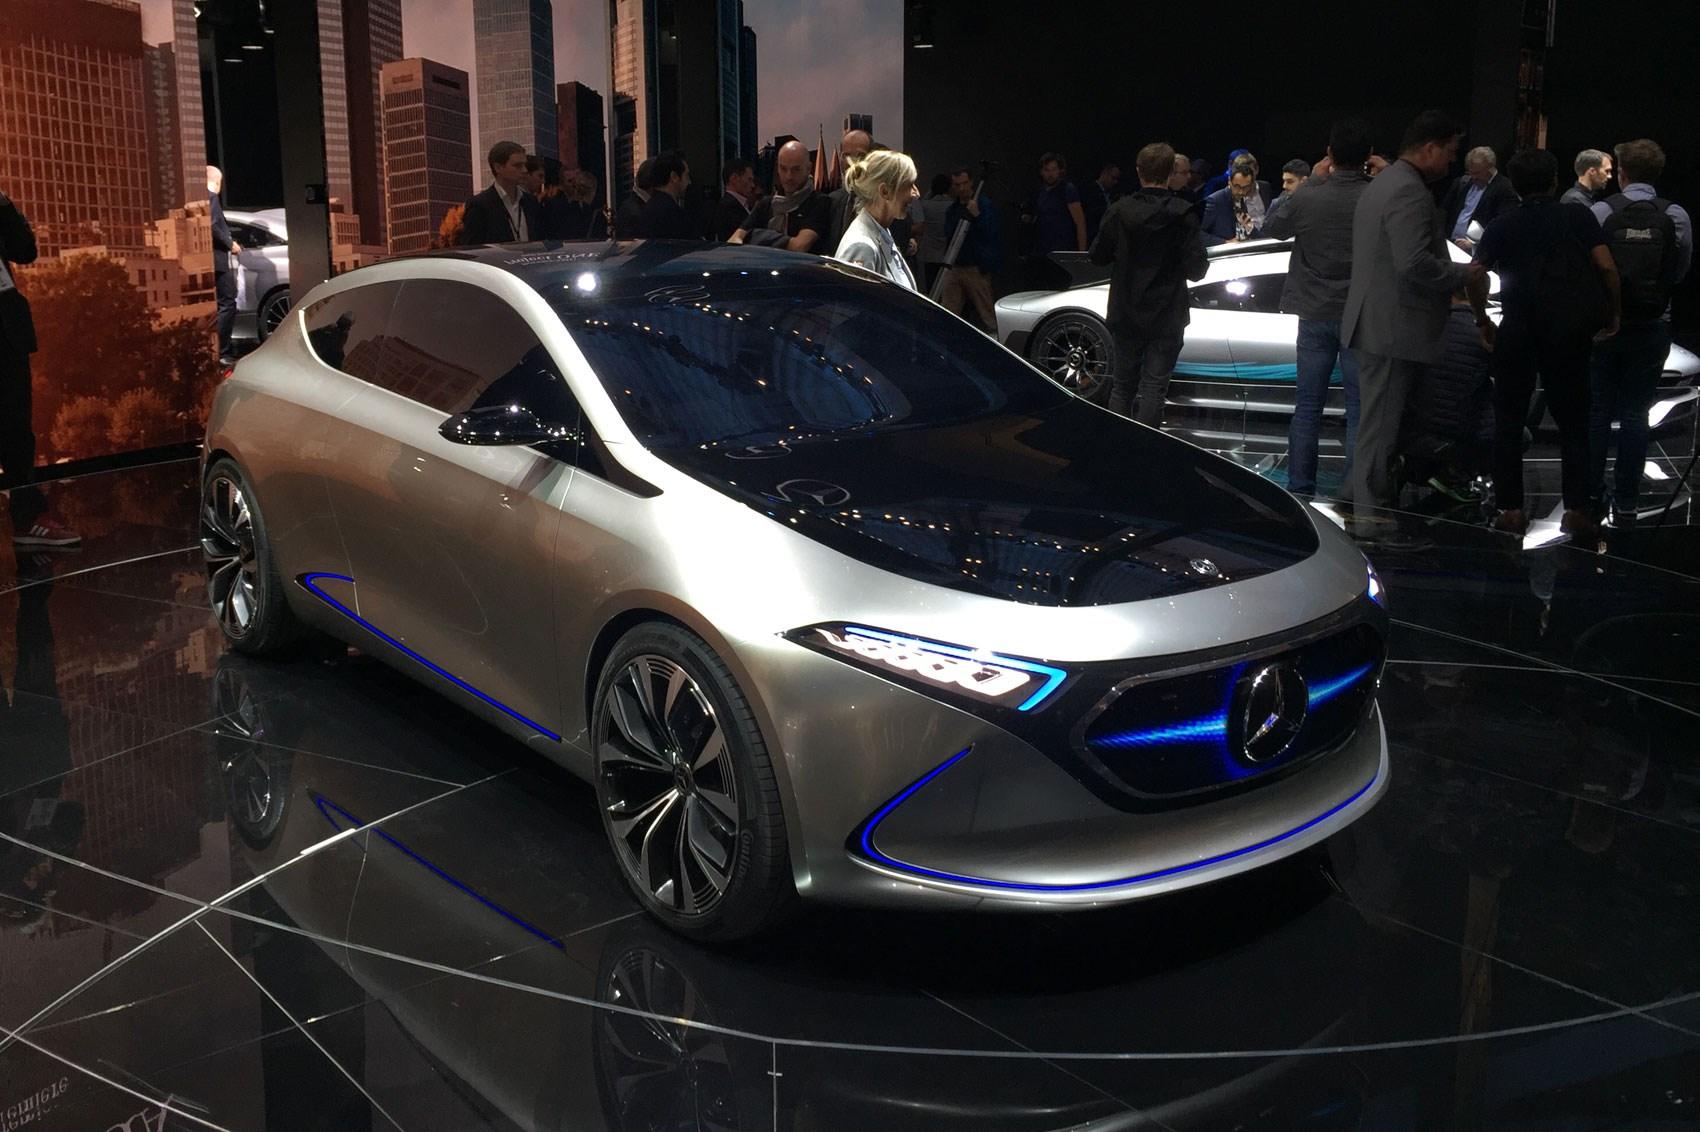 Mercedes Concept EQA: dinky EV concept shown at Frankfurt 2017 | CAR ...